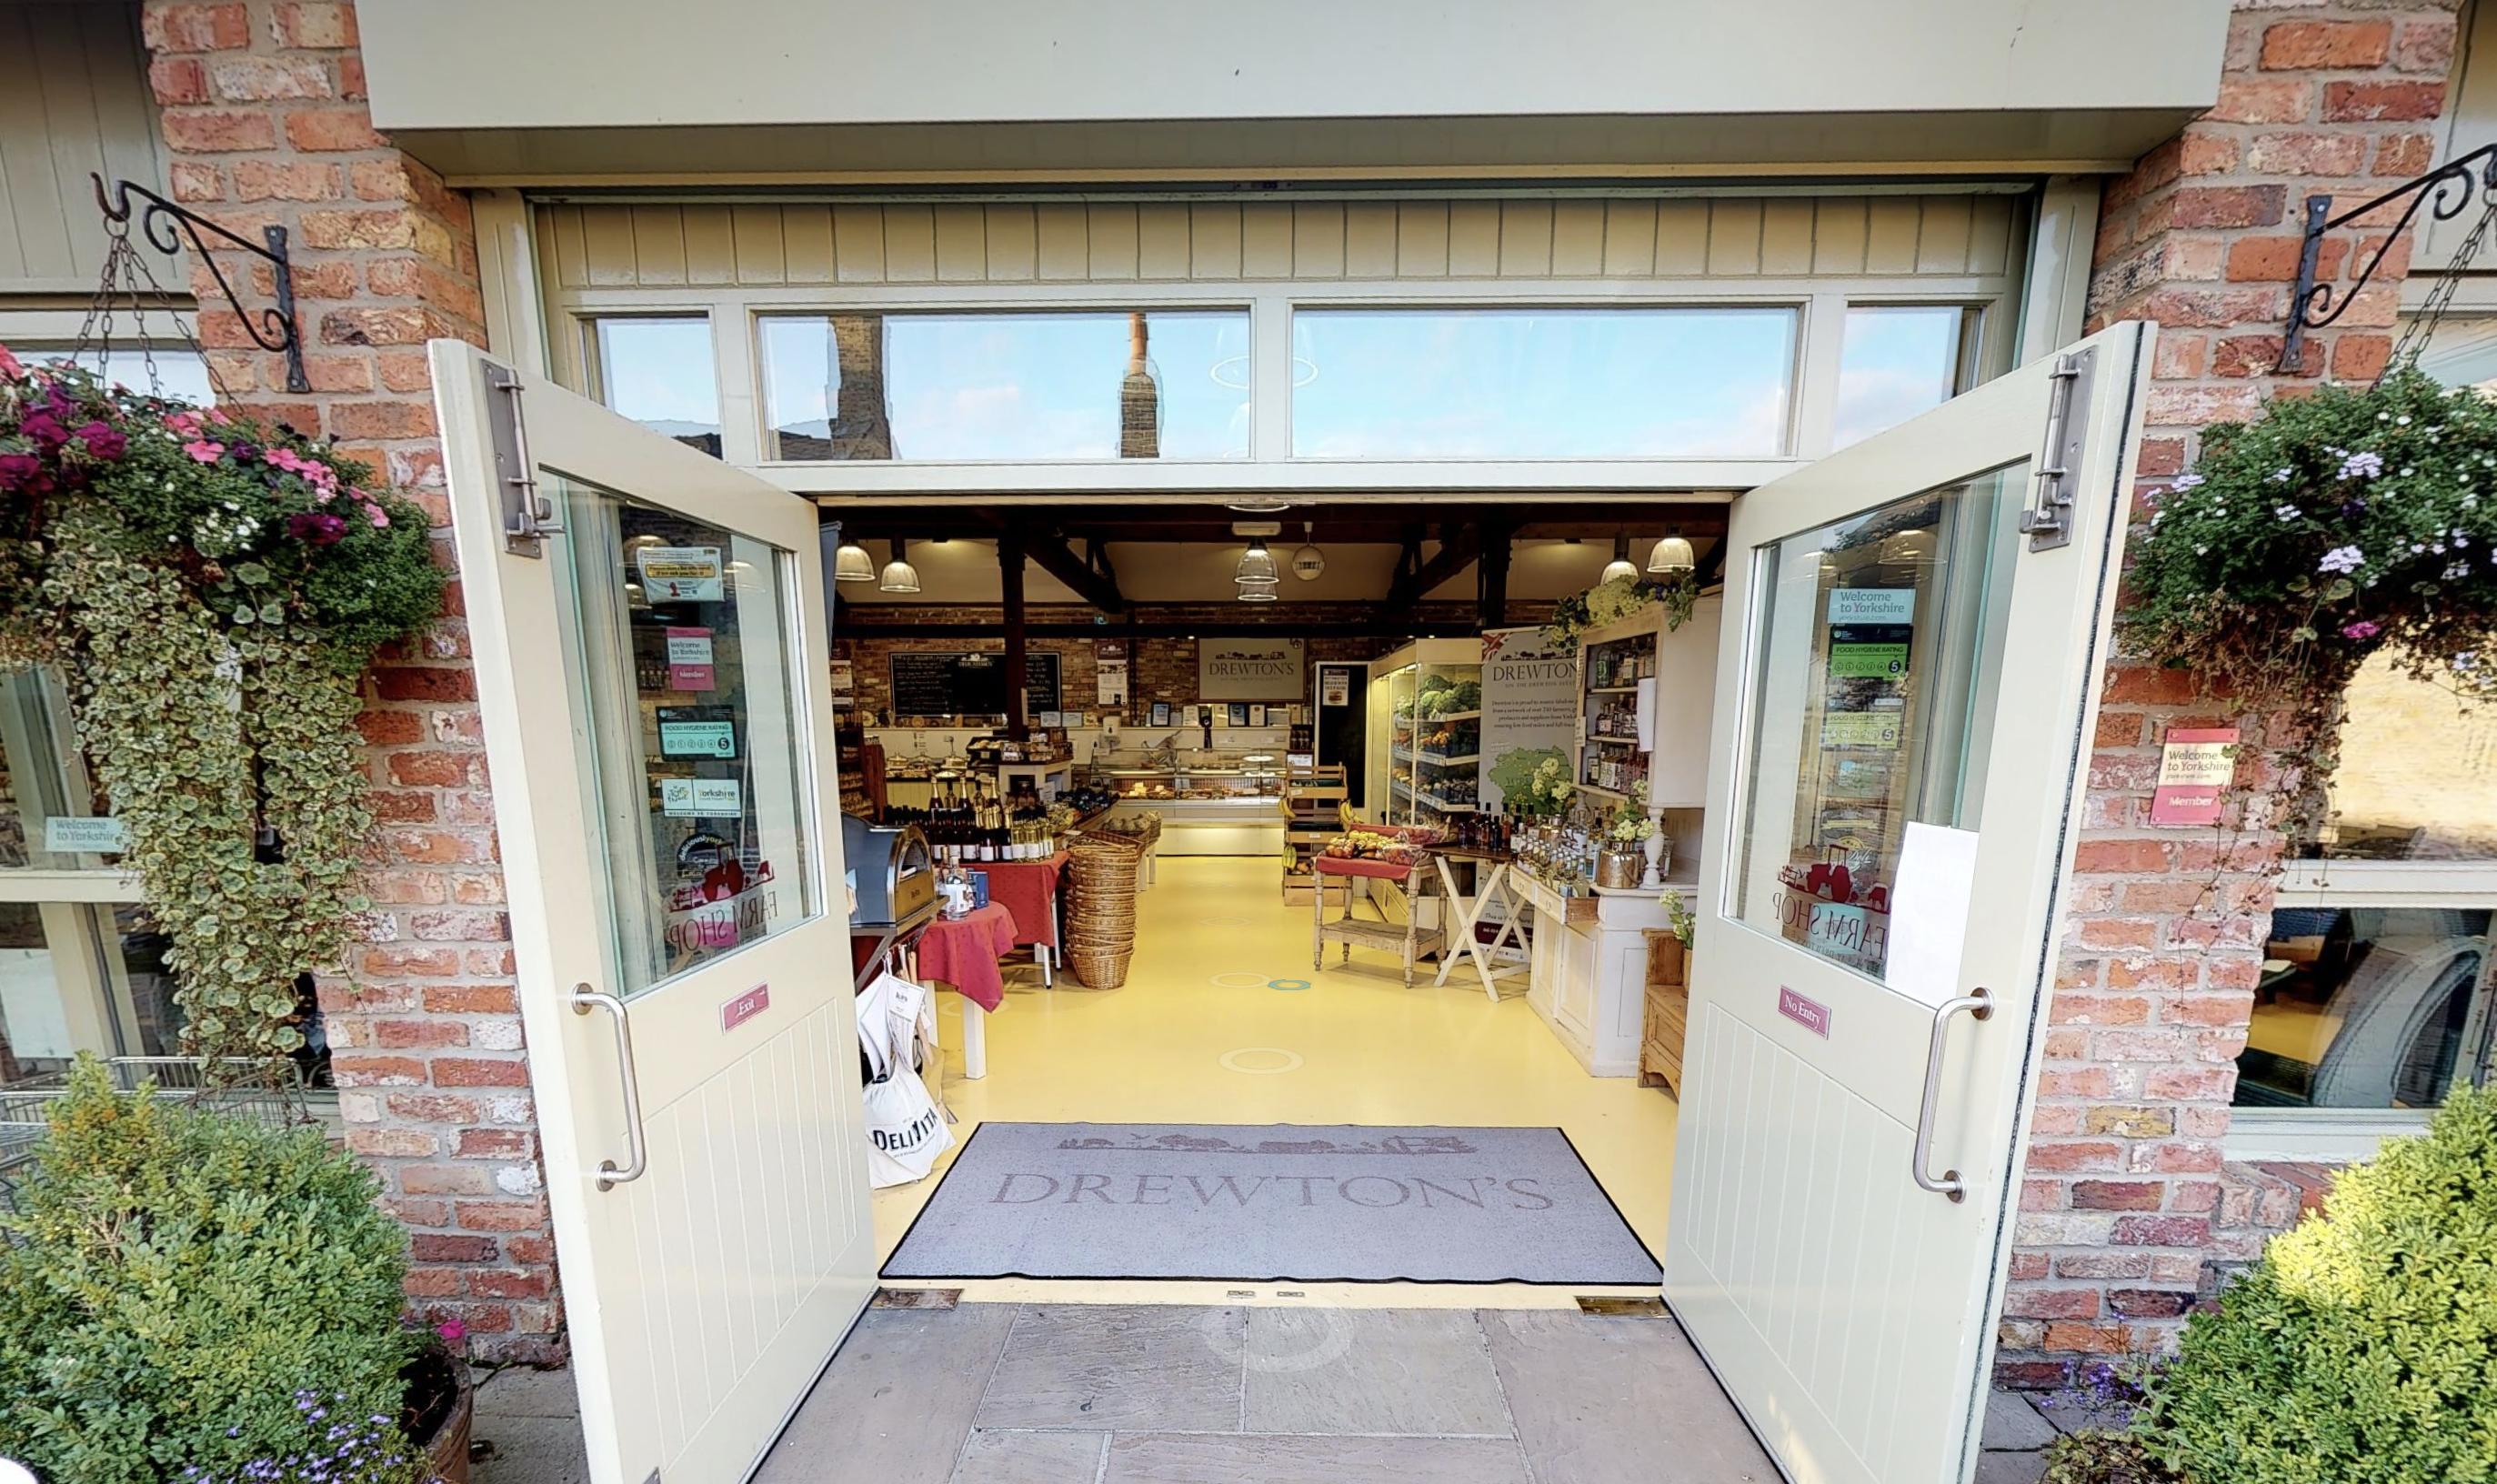 Drewtons Farm Shop